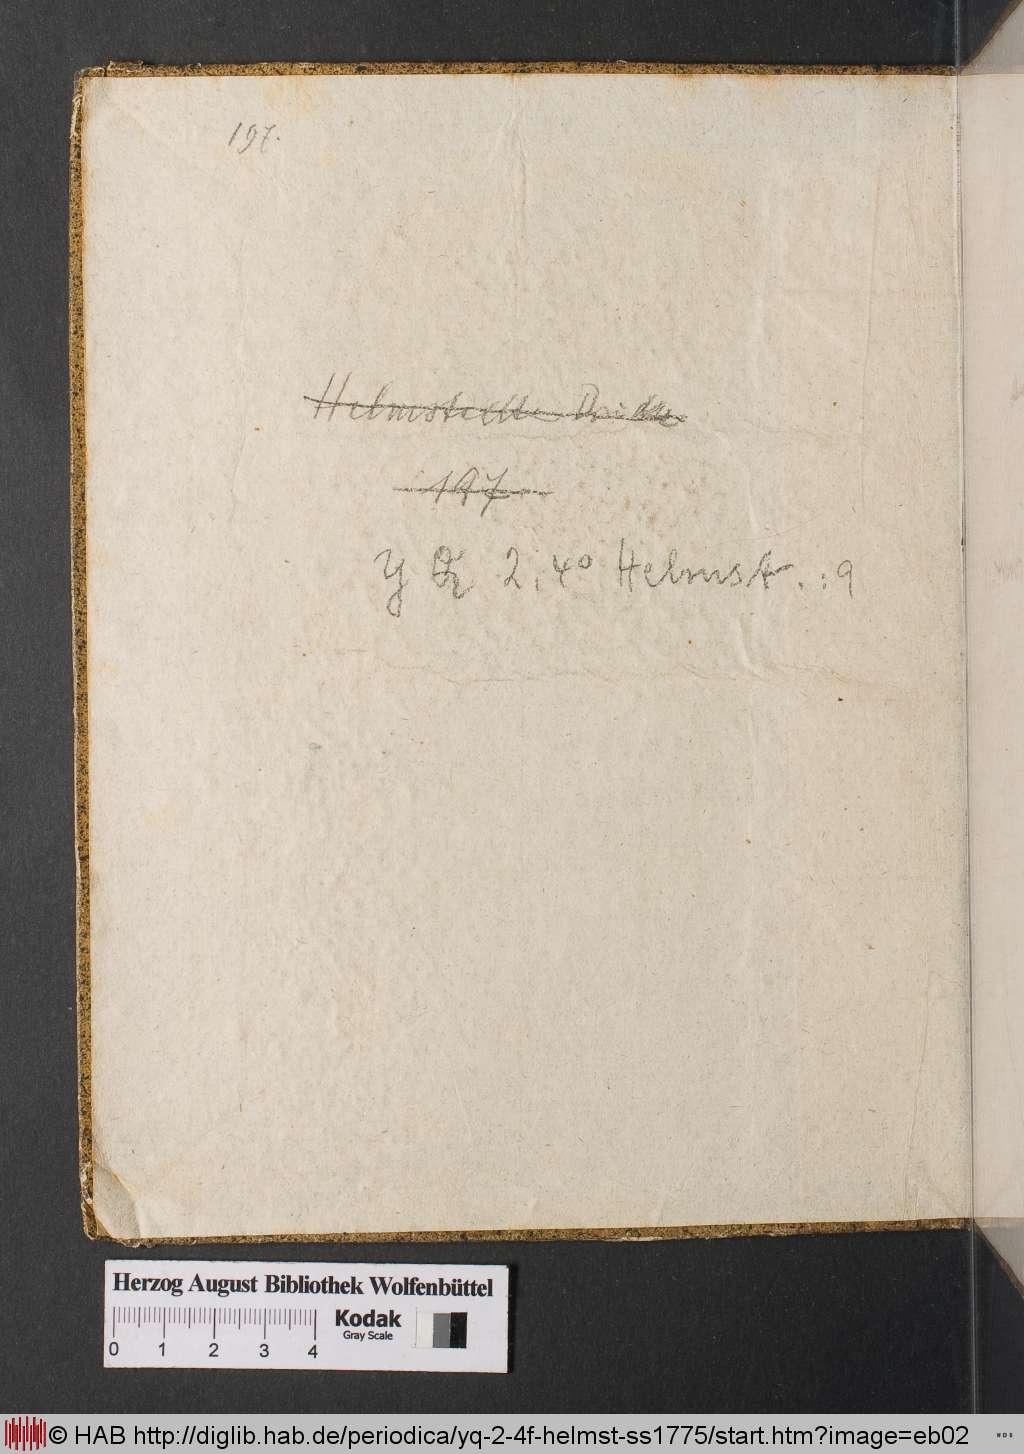 http://diglib.hab.de/periodica/yq-2-4f-helmst-ss1775/eb02.jpg